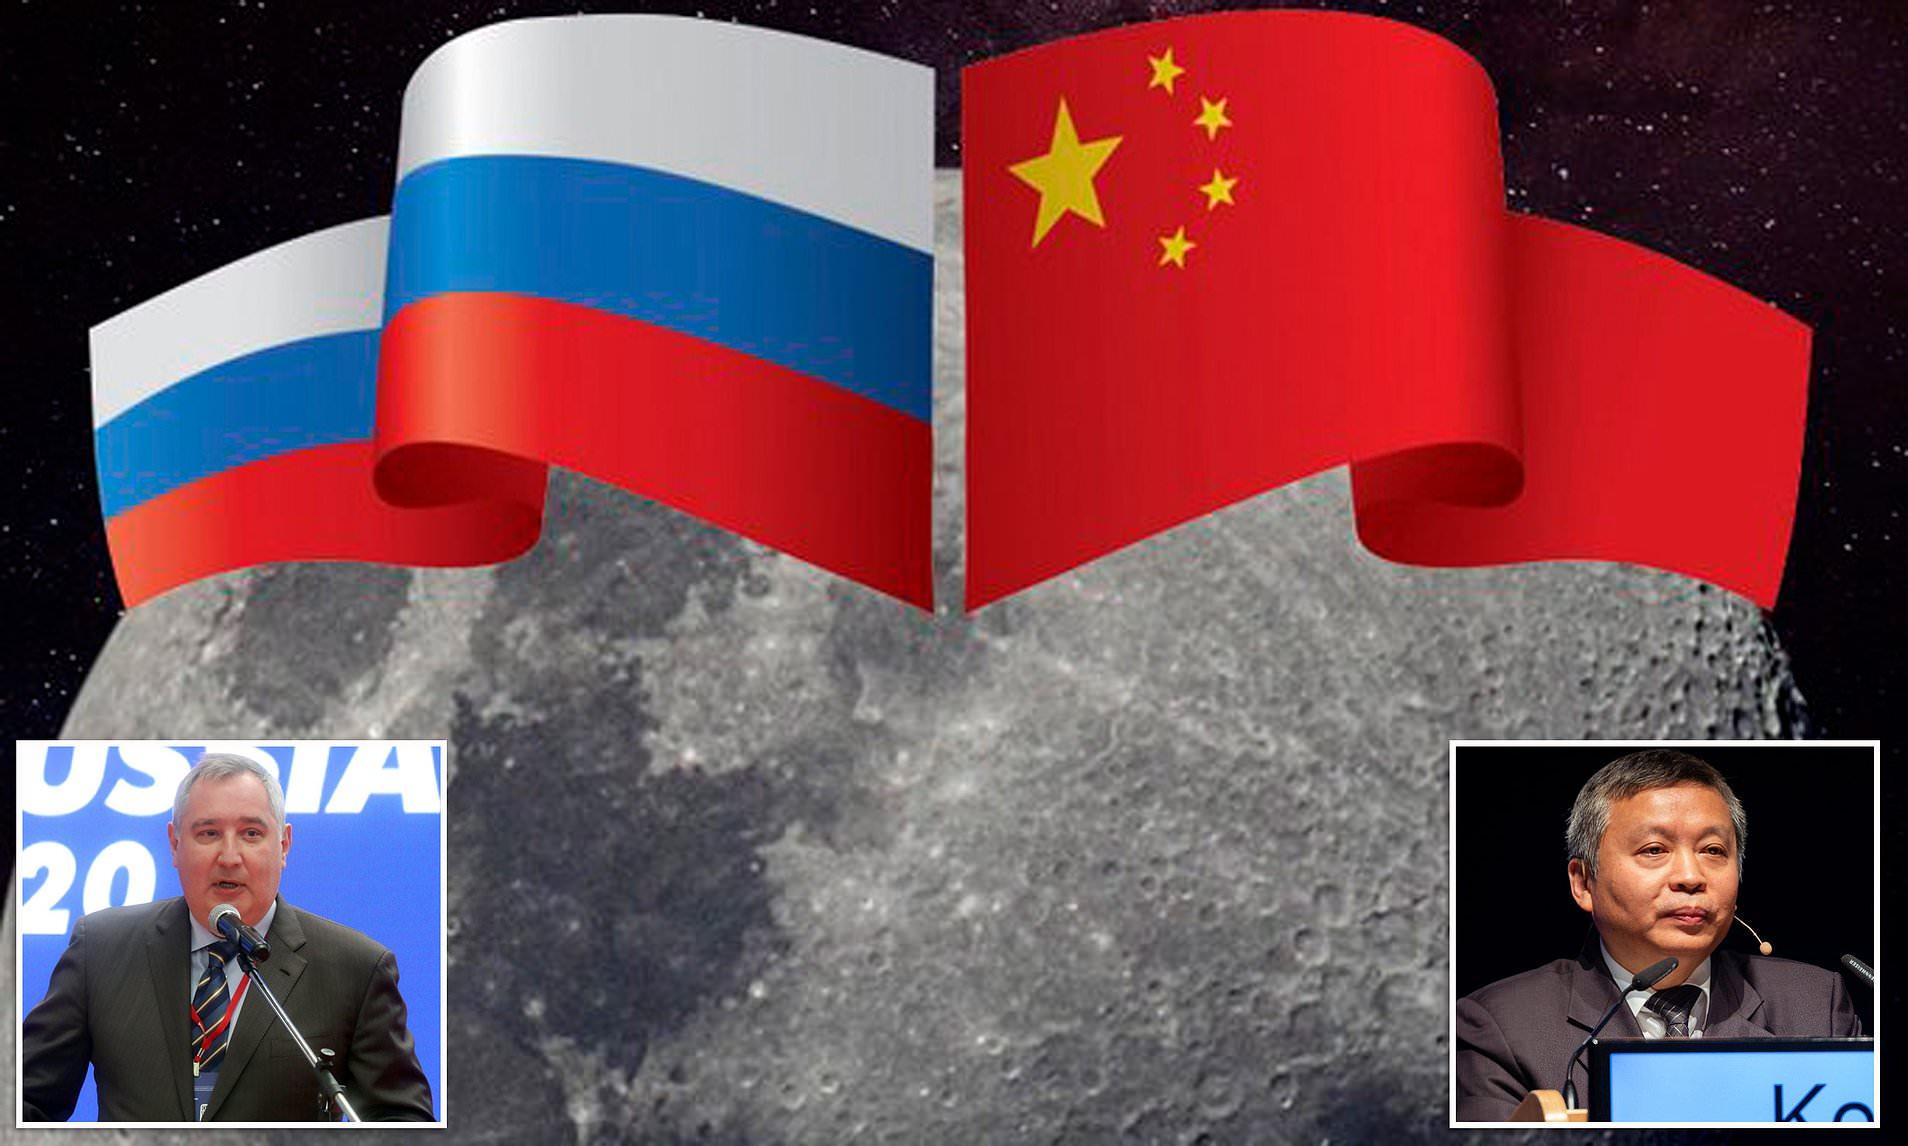 Rússia e China cooperam para construir base na Lua